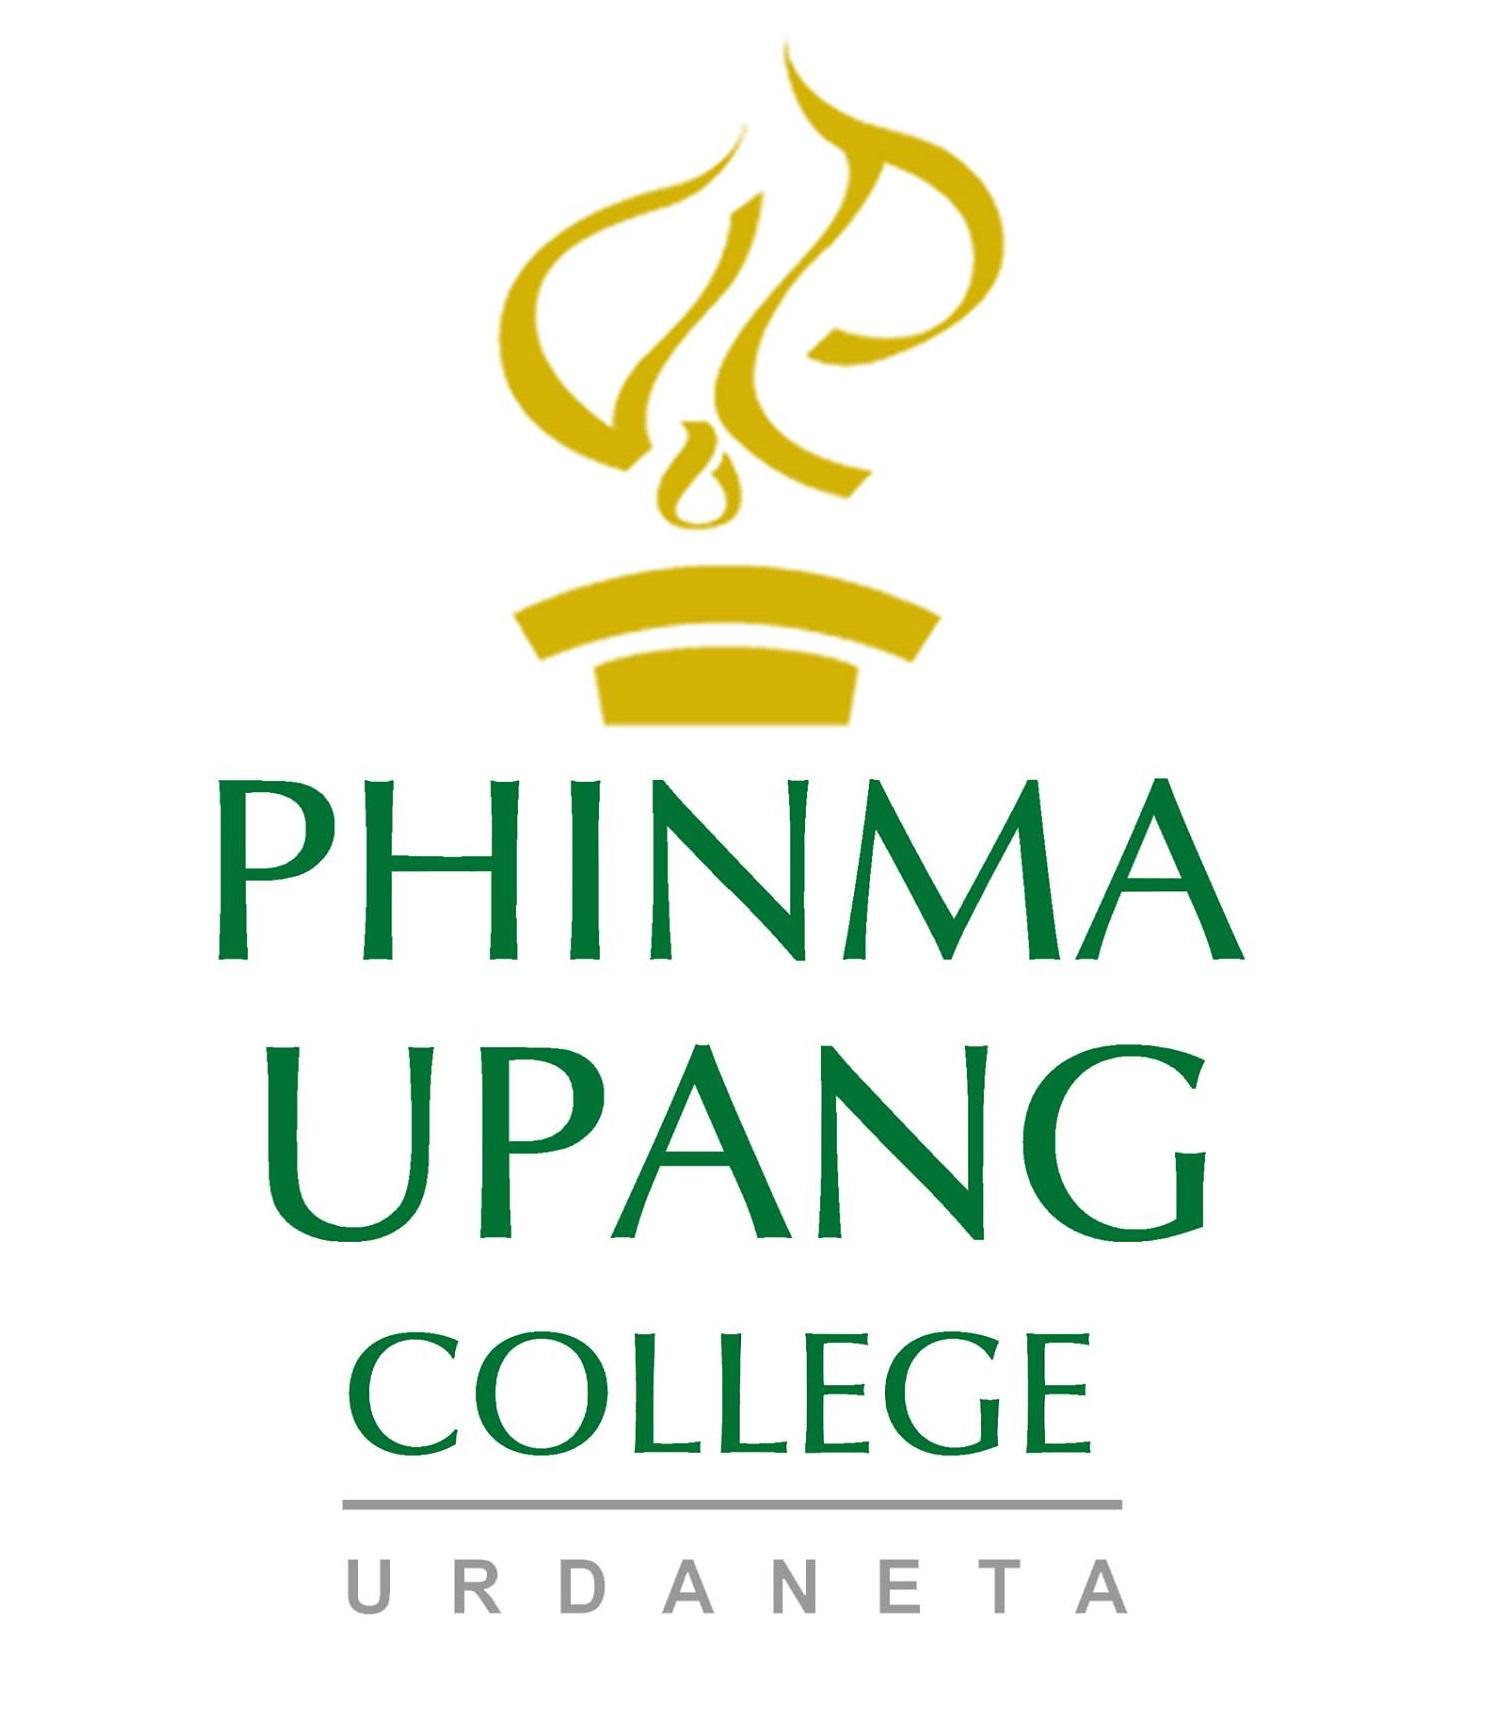 PHINMA UPang College Urdaneta